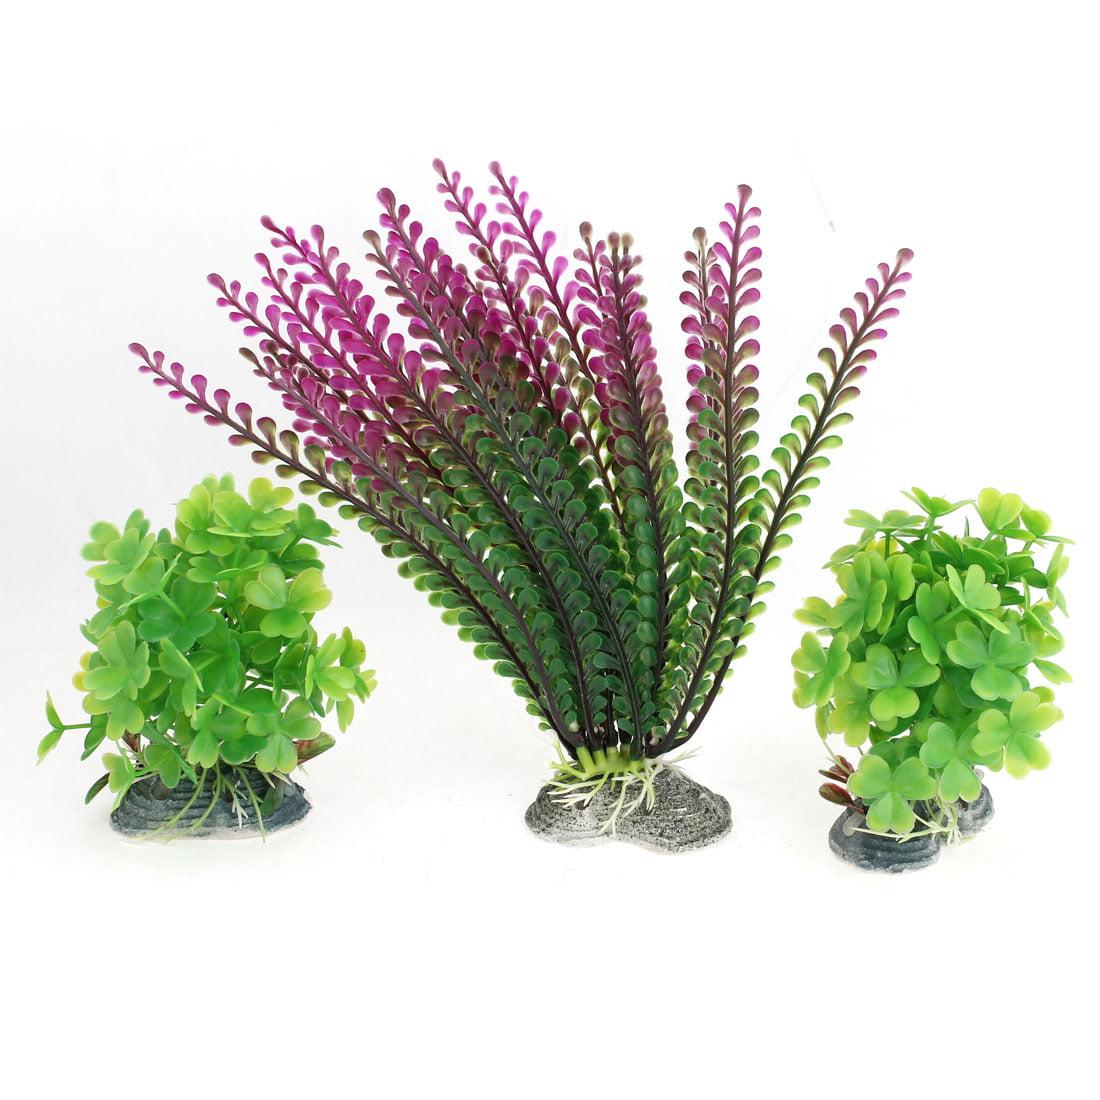 Unique Bargains Aquarium Ceramic Base Purple Green Artificial Plant Grass 3 Pcs